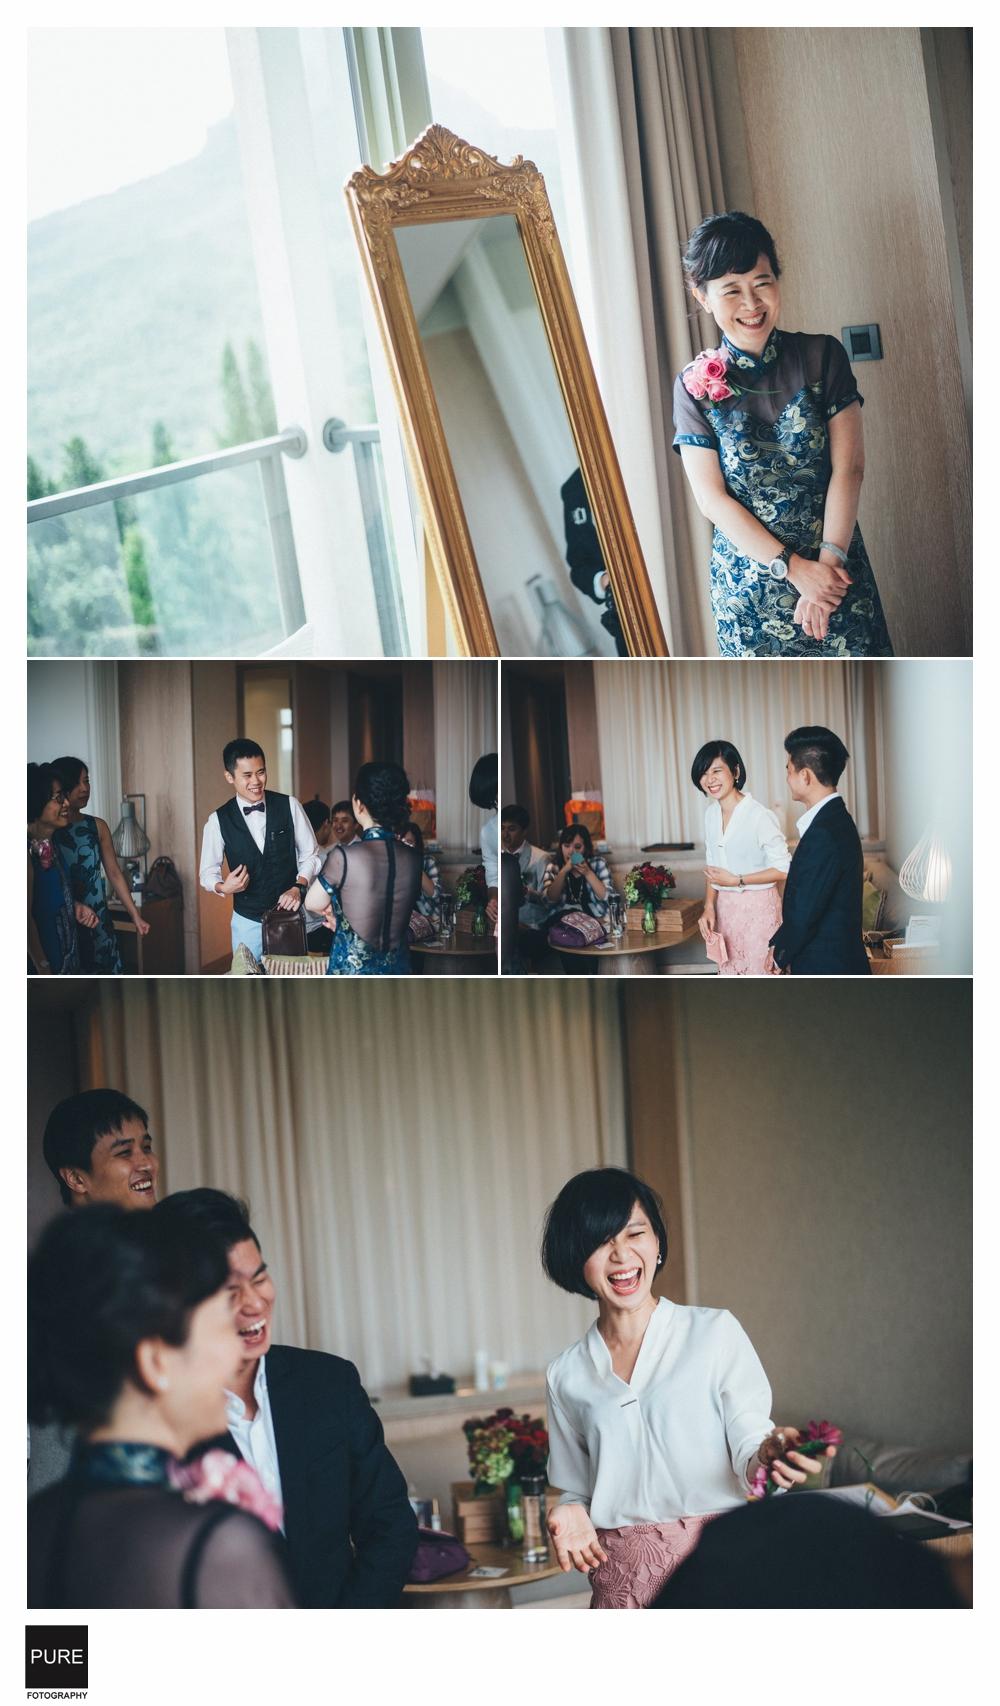 PUREFOTO_台灣婚禮平面攝影wedding_PURE美式婚禮攝影